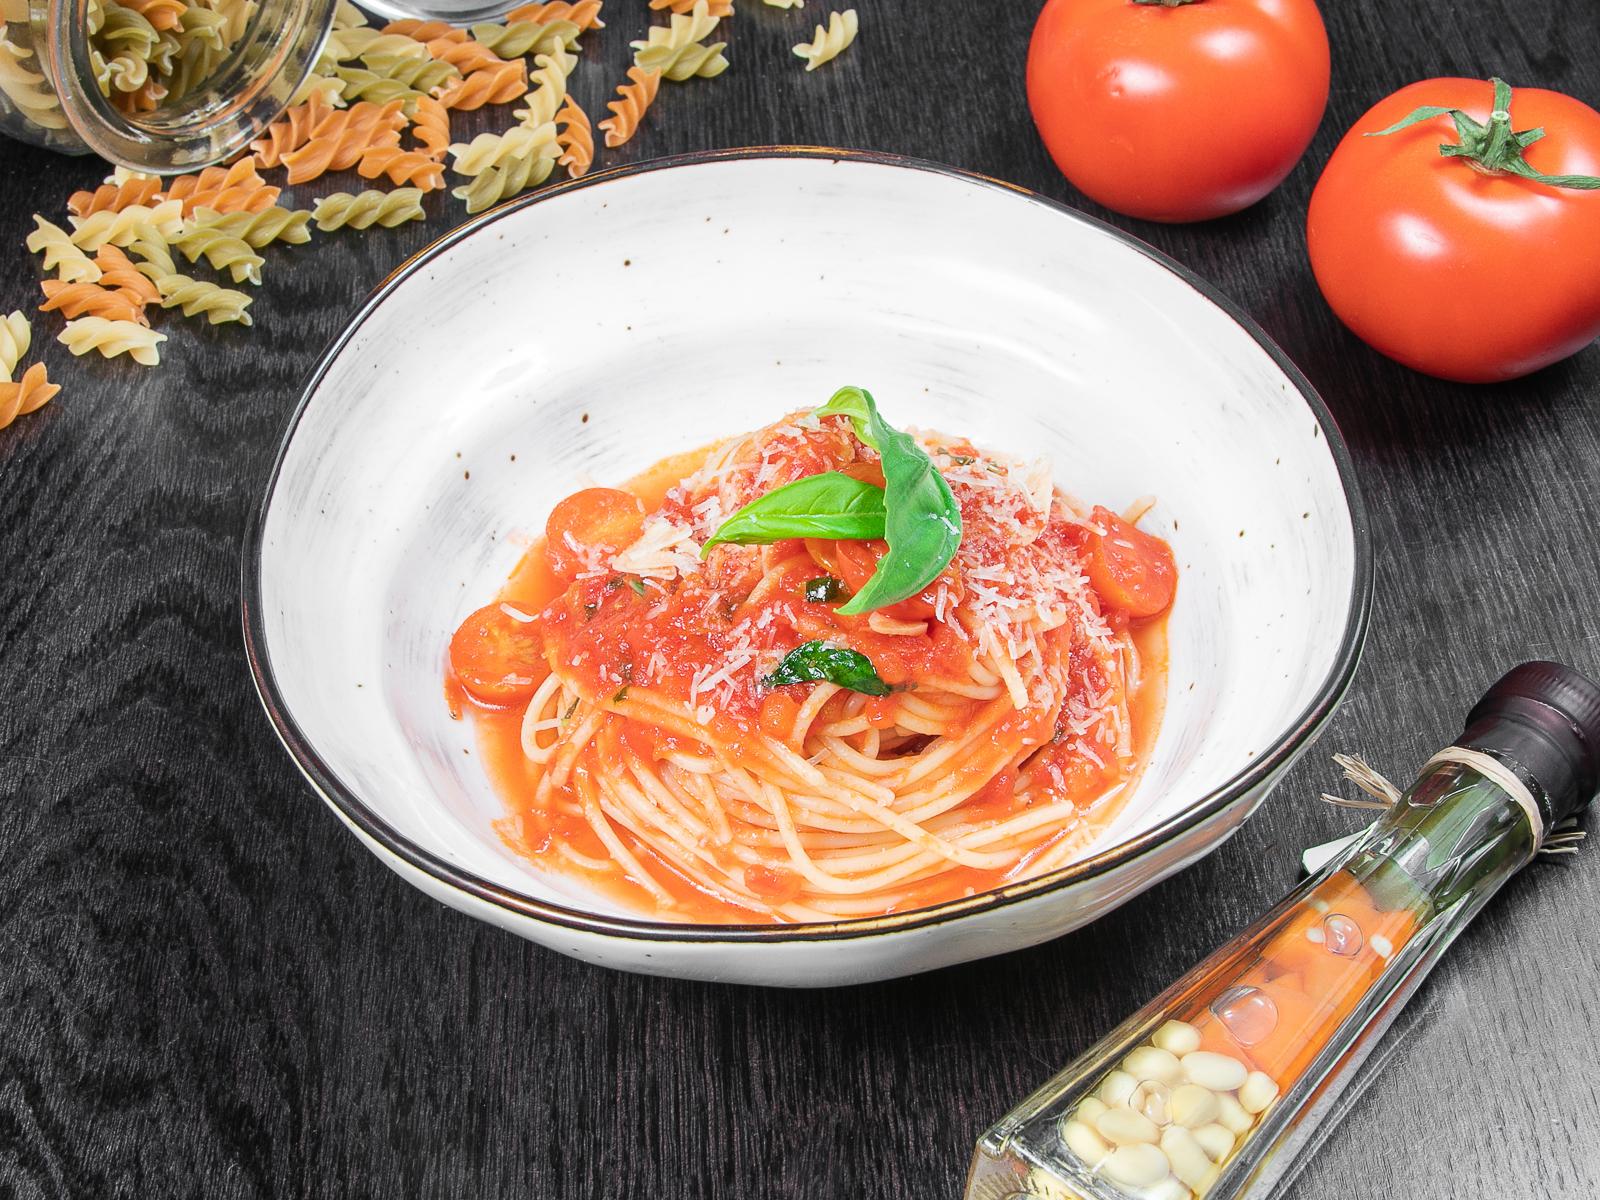 Спагетти с соусом помодоро и базиликом